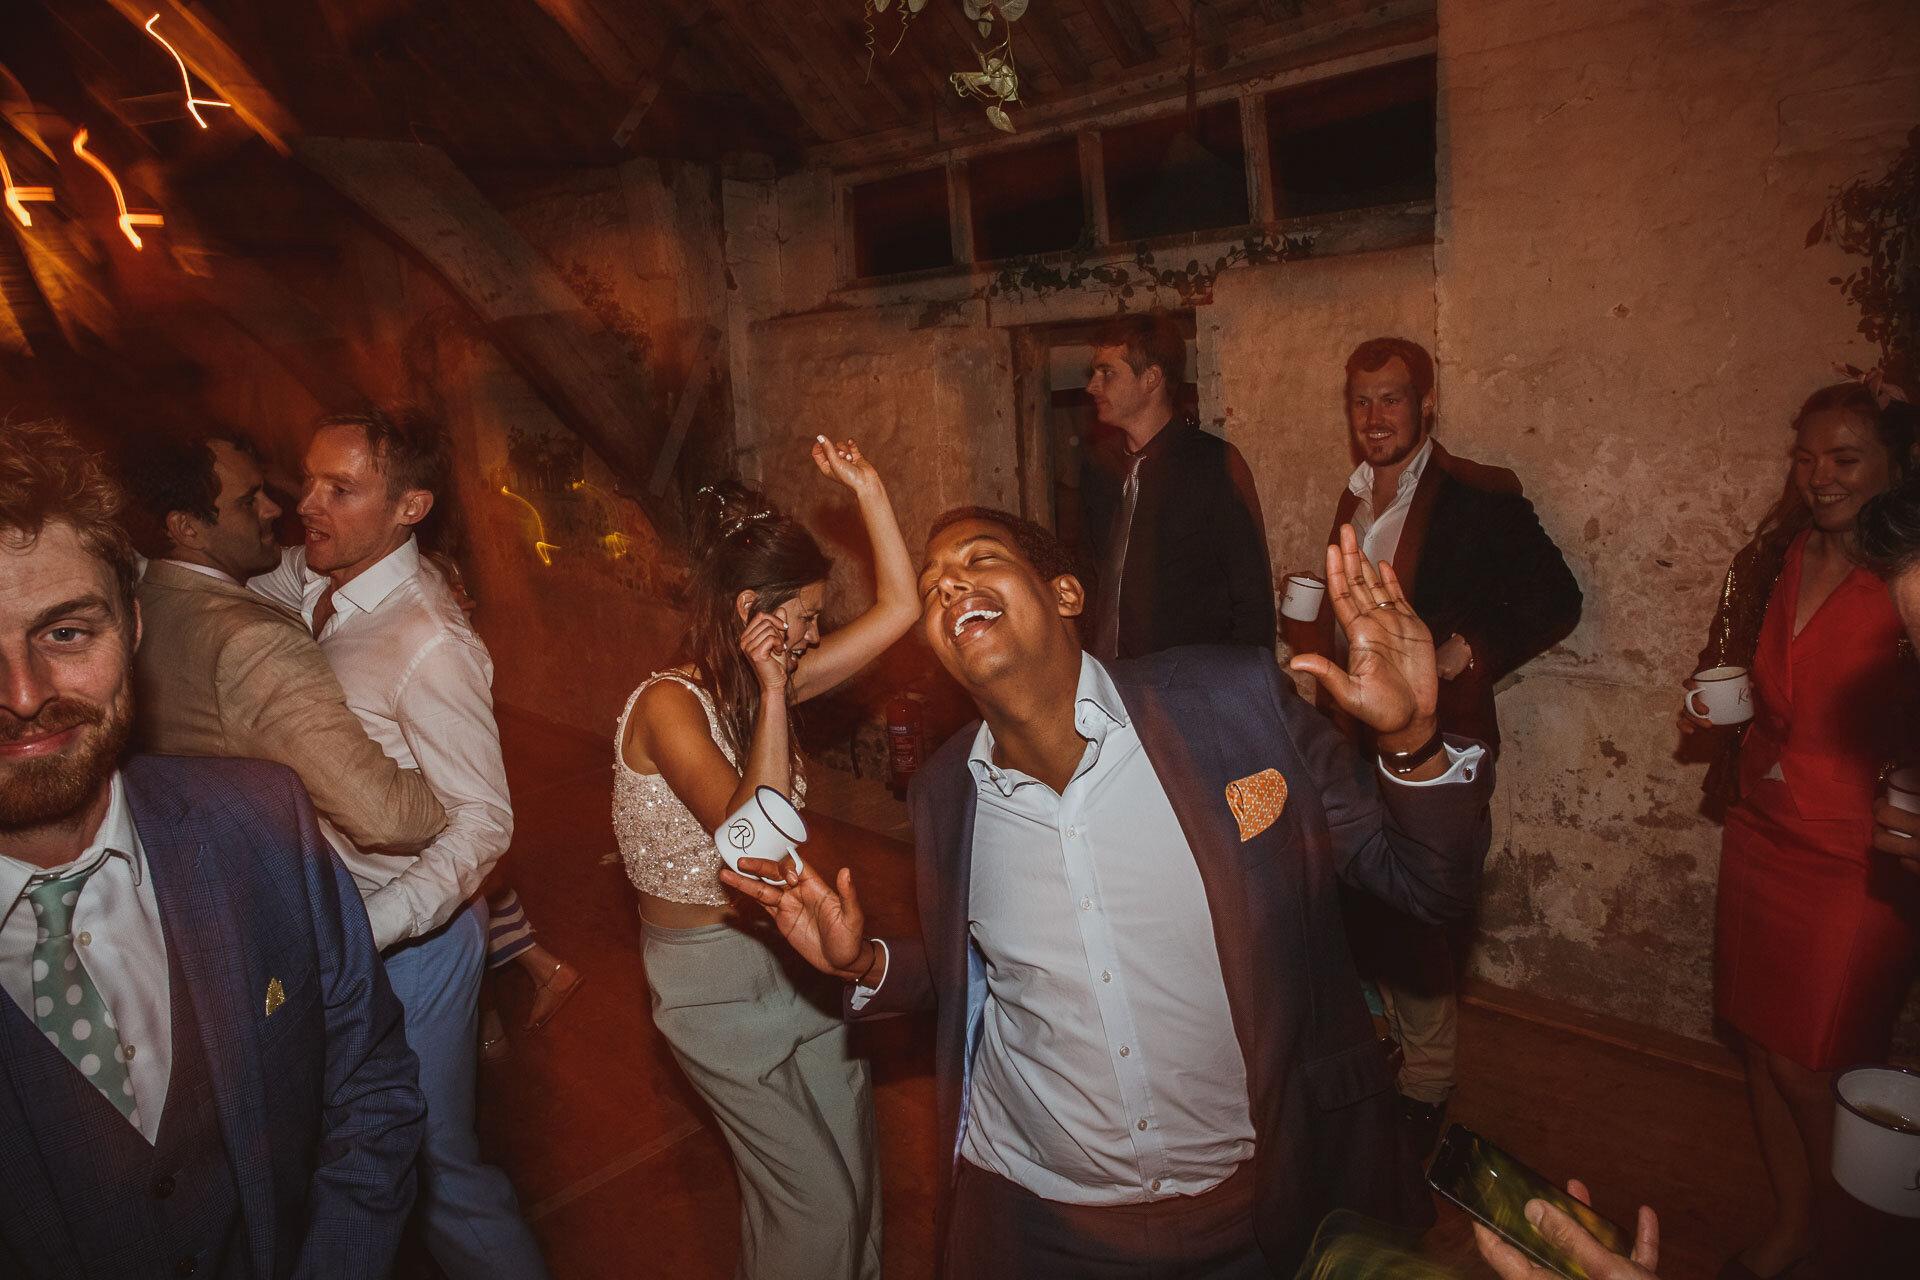 dorset_wedding_photographer-159.jpg